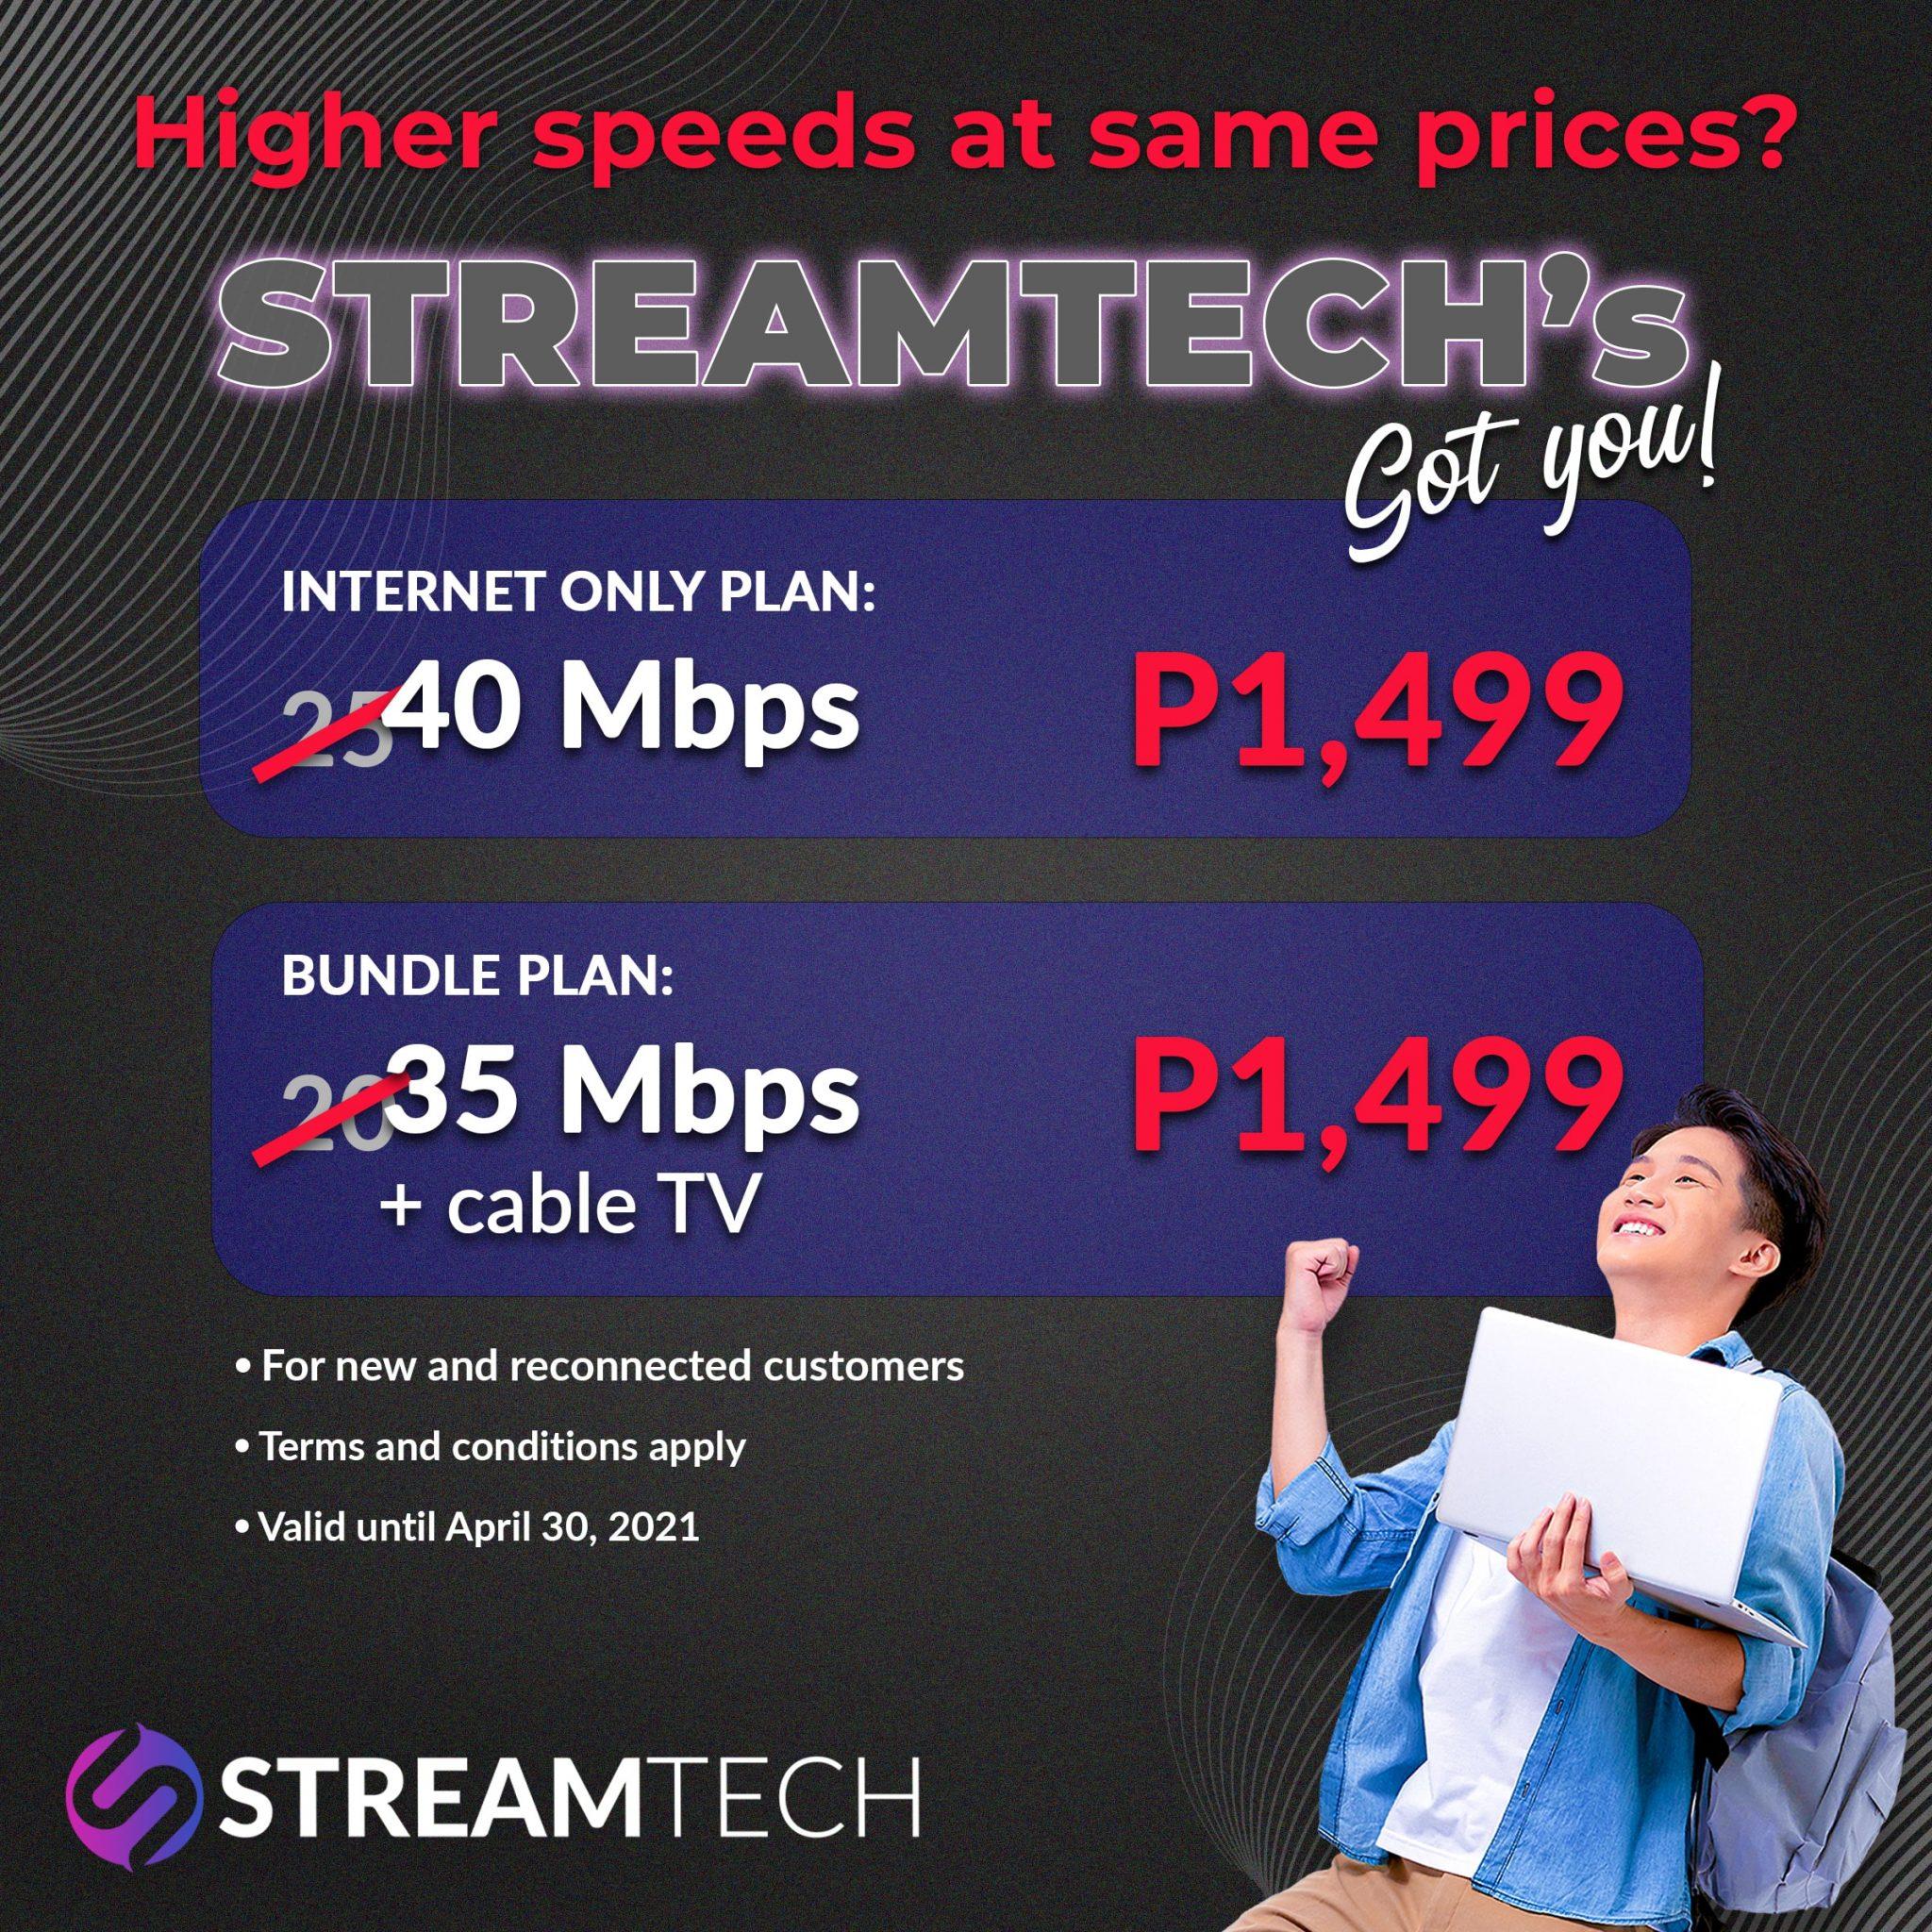 Streamtech's fiber internet in batangas offers speed upgrade